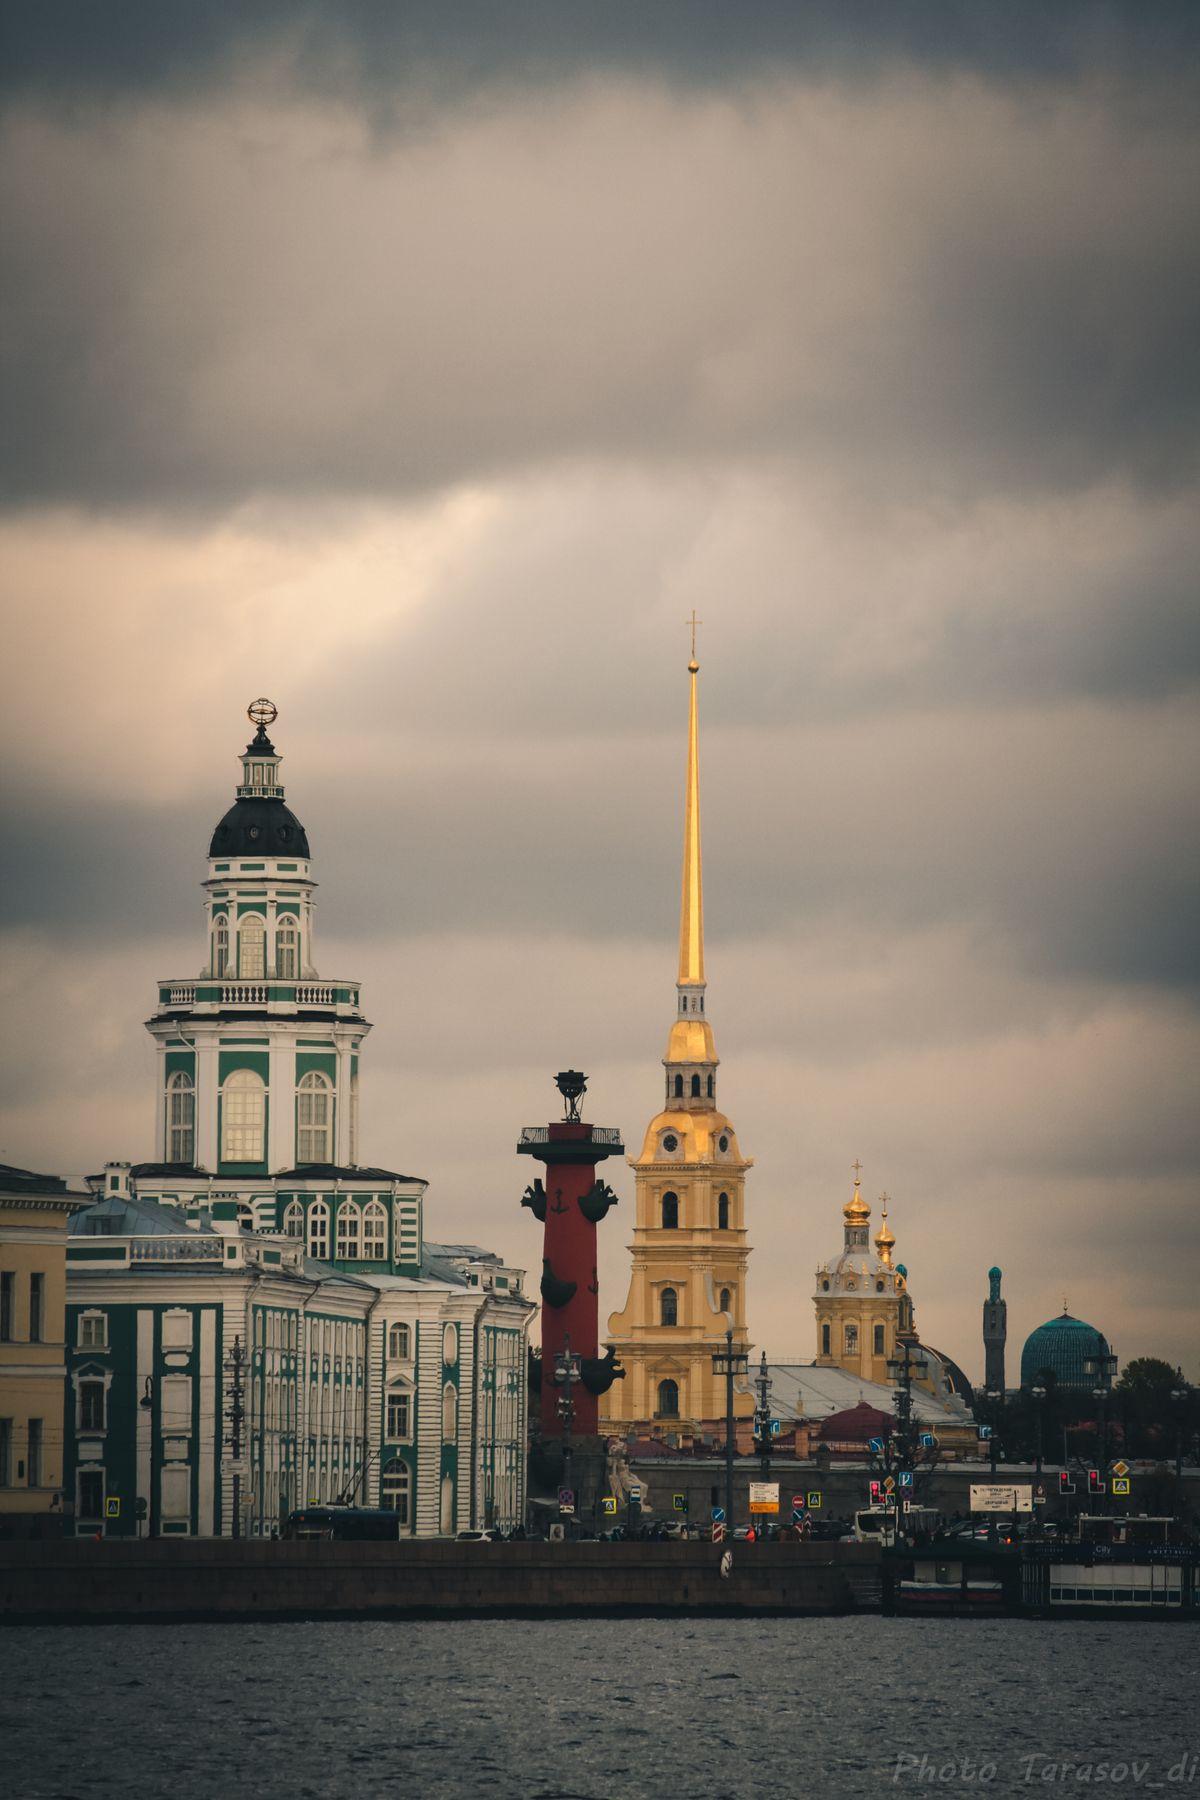 линия зданий Санкт-Петербург архитектура здания памятник